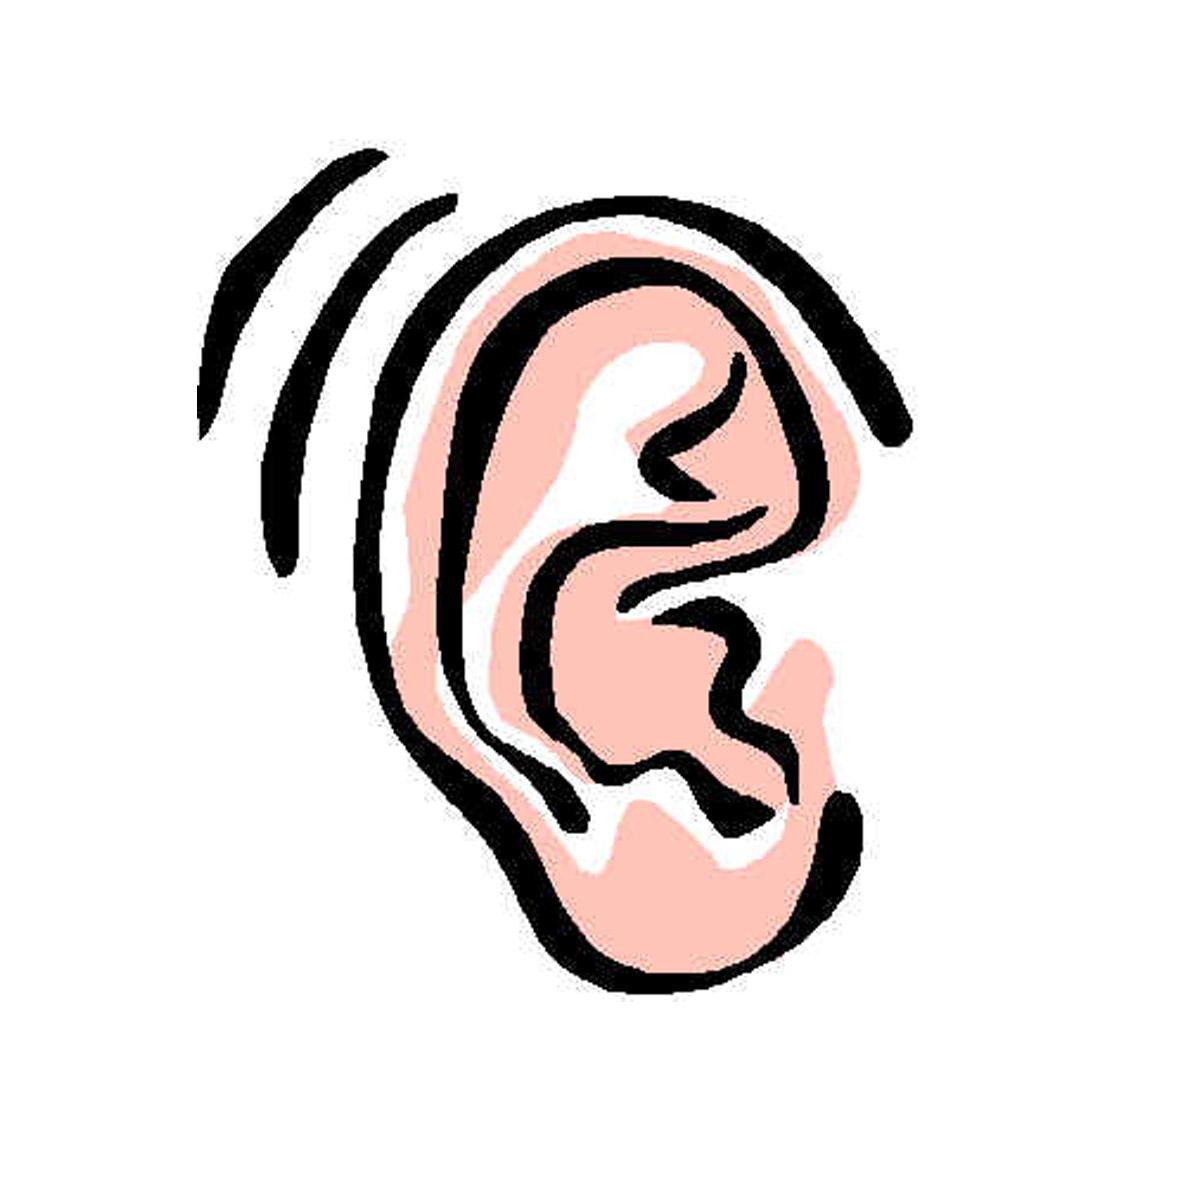 Noise clipart effective listening Clipart listener%20clipart Listen Clipart Clipart